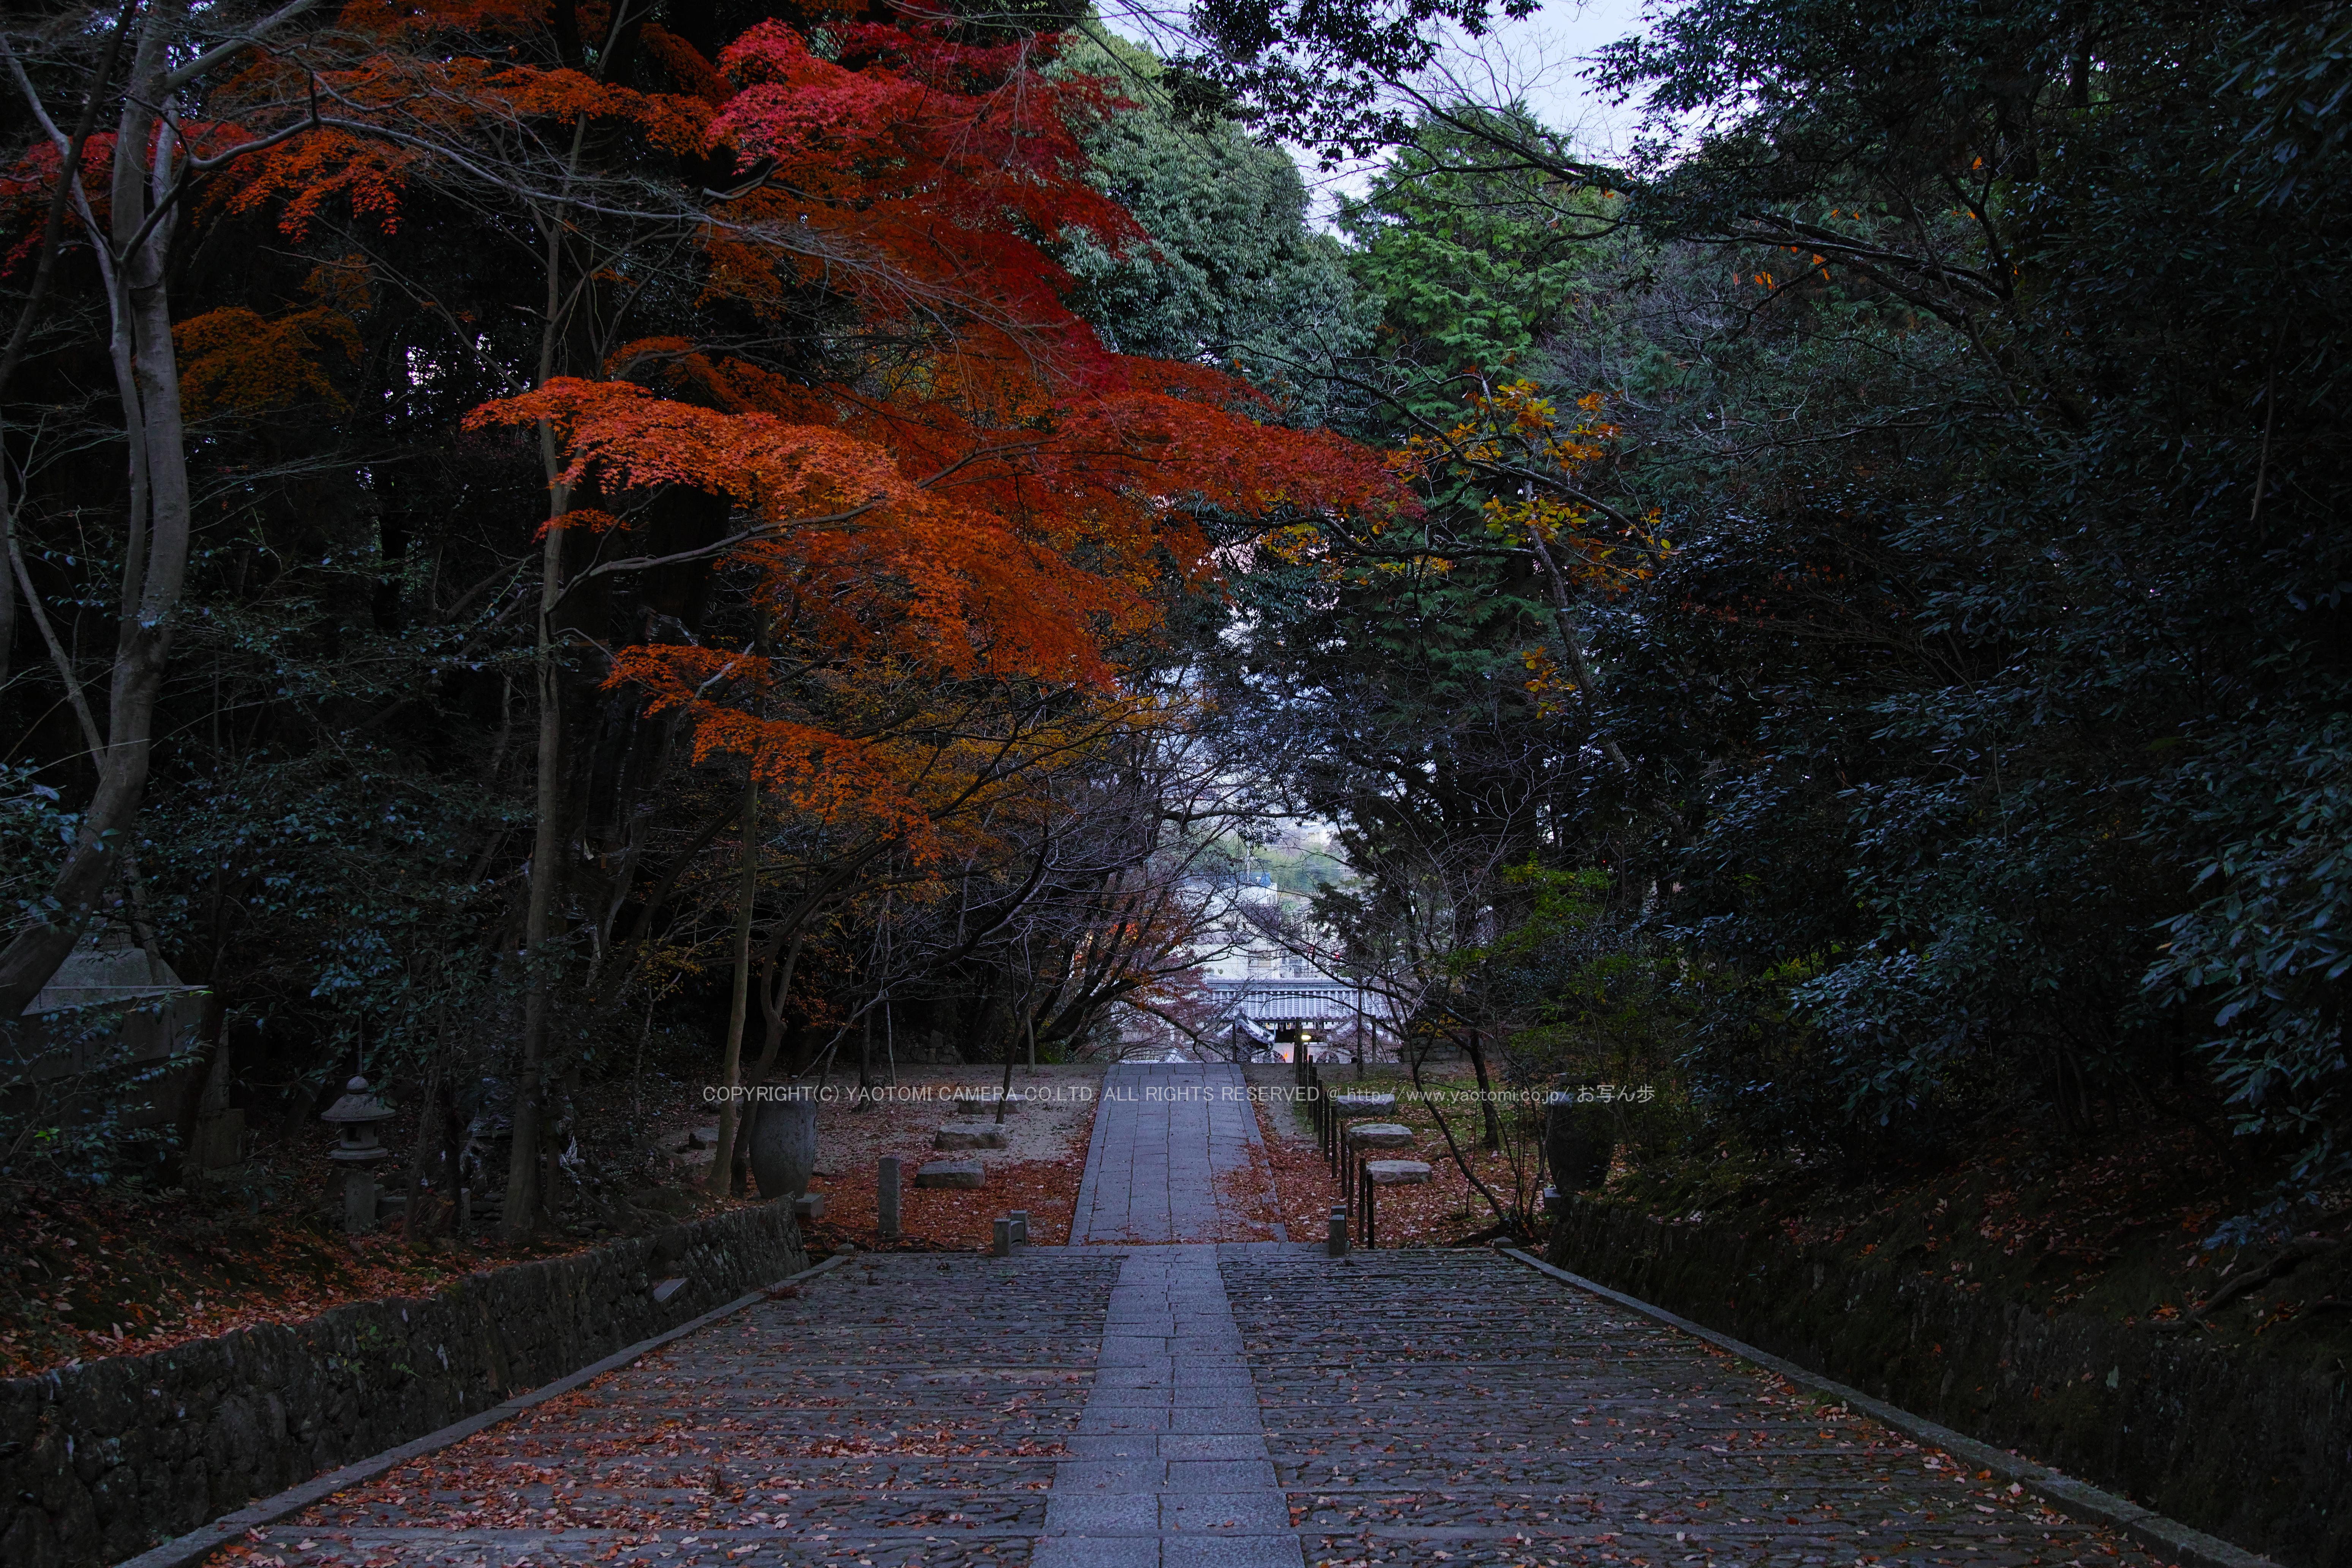 http://www.yaotomi.co.jp/blog/walk/SDQH0280%2C2016yaotomi%201.jpg